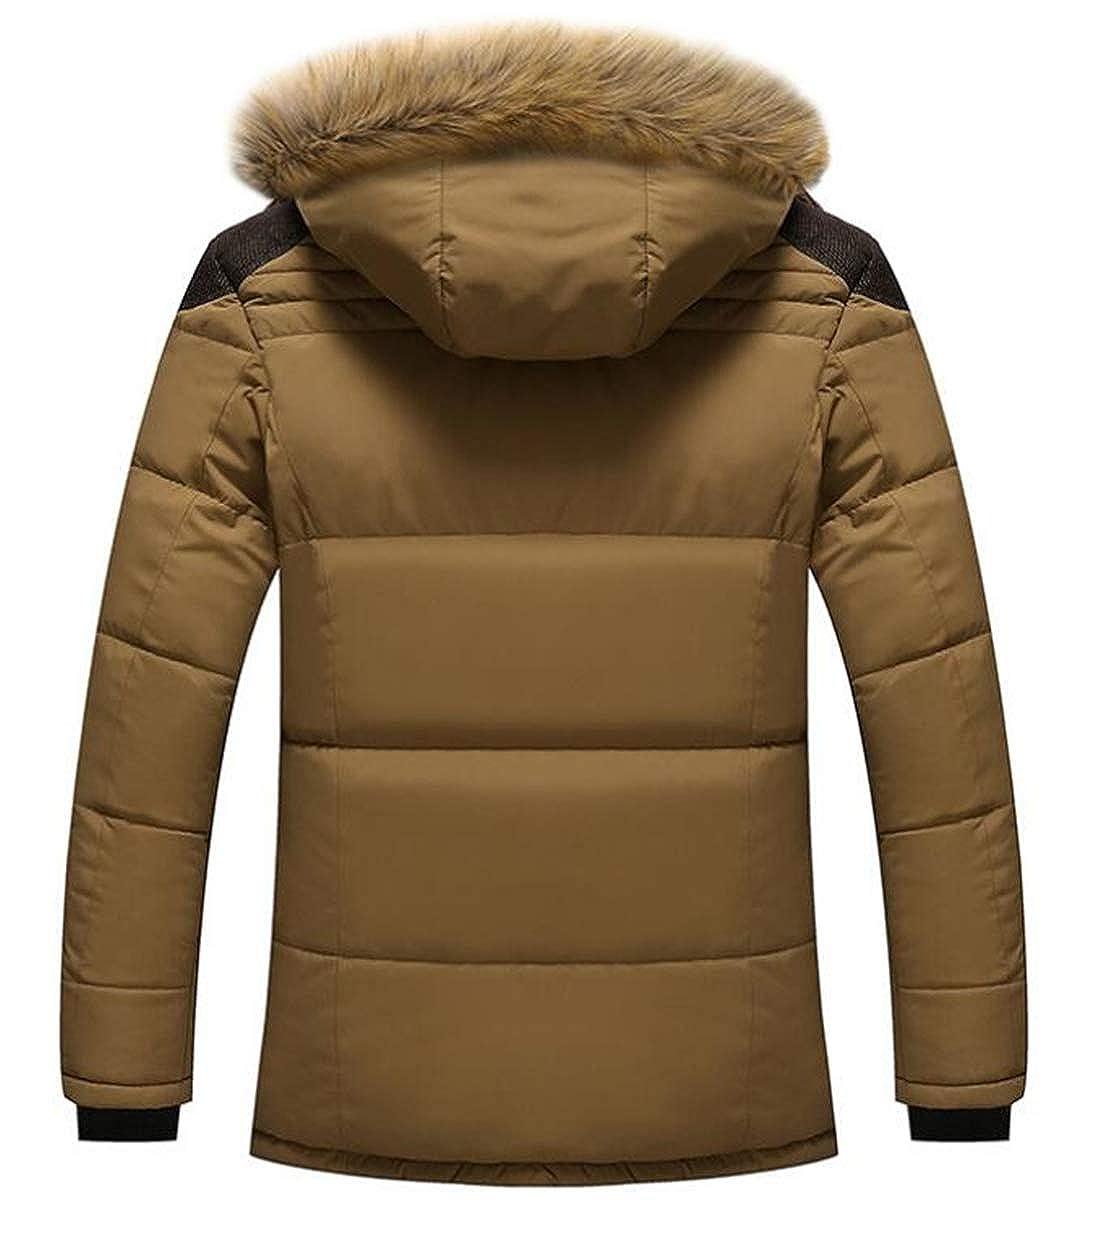 Domple Men Hooded Thicken Warm Faux Fur Collar Winter Fleece Lined Down Puffer Jacket